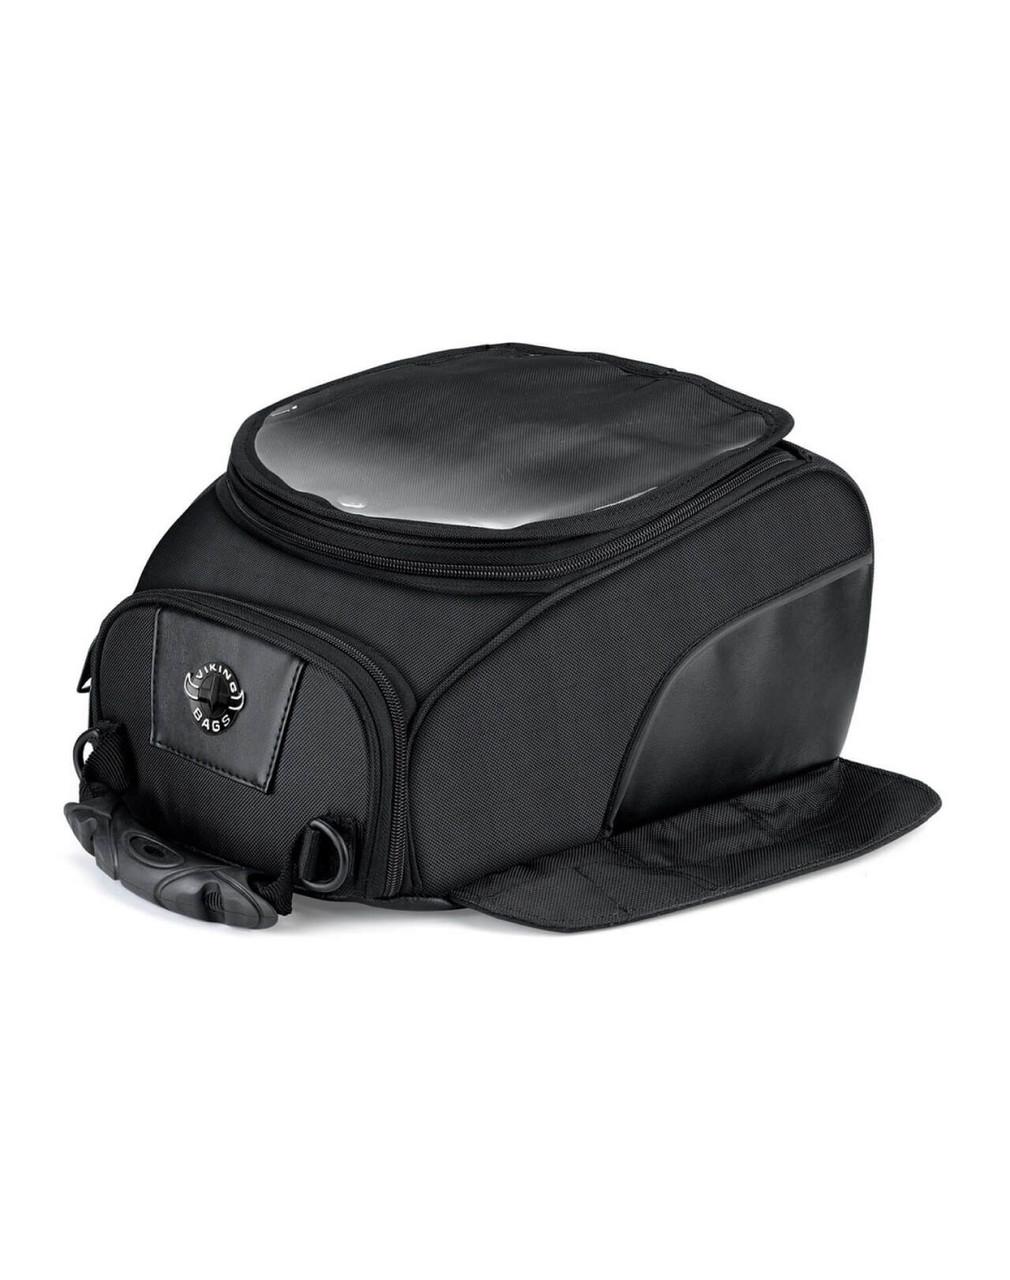 VikingBags 14 Large Magnetic Motorcycle Tank Bag For Harley Davidson Main Bag View